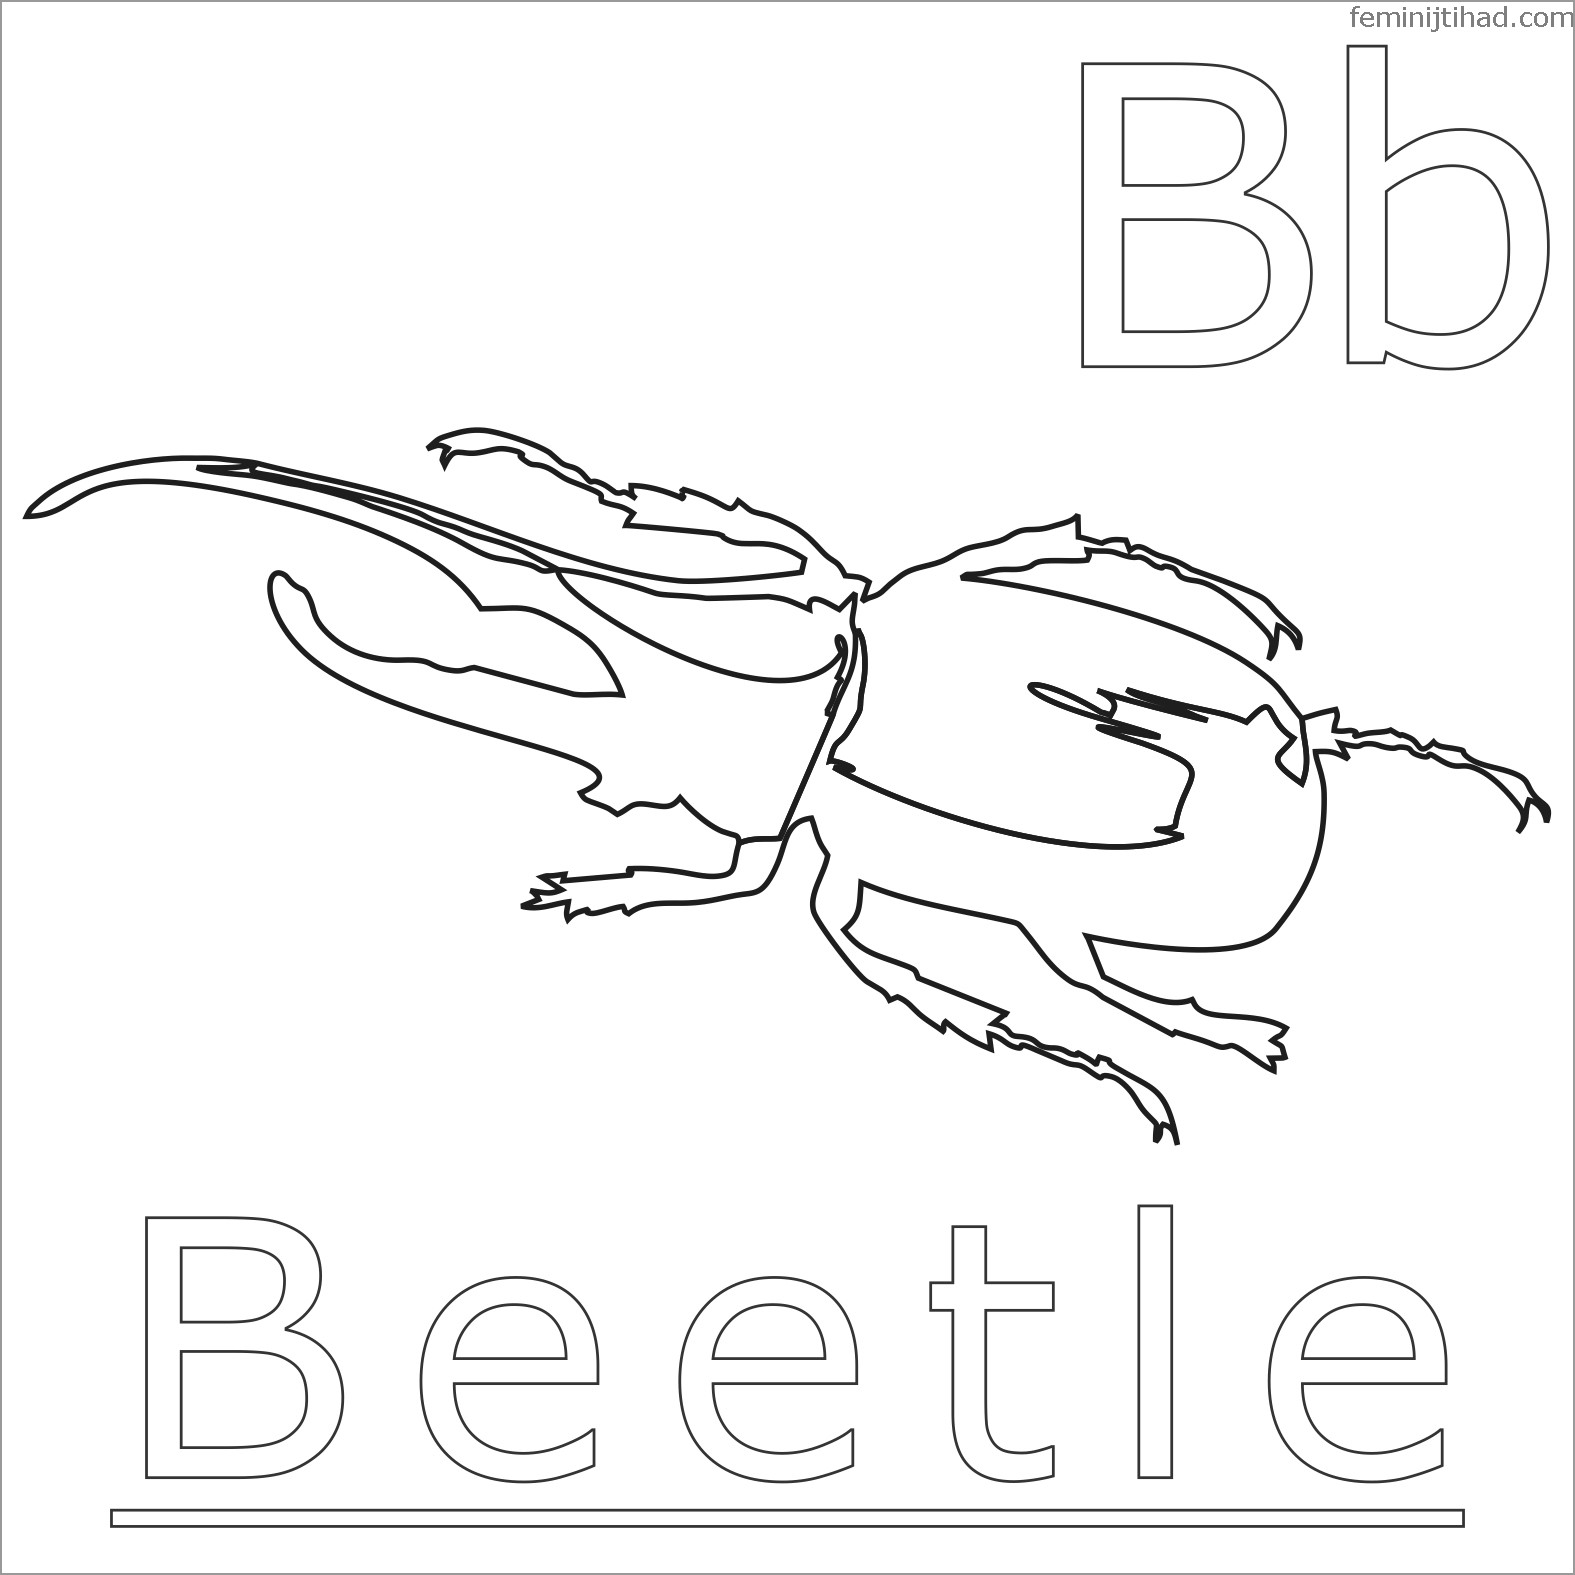 Darkling Beetle Coloring Page